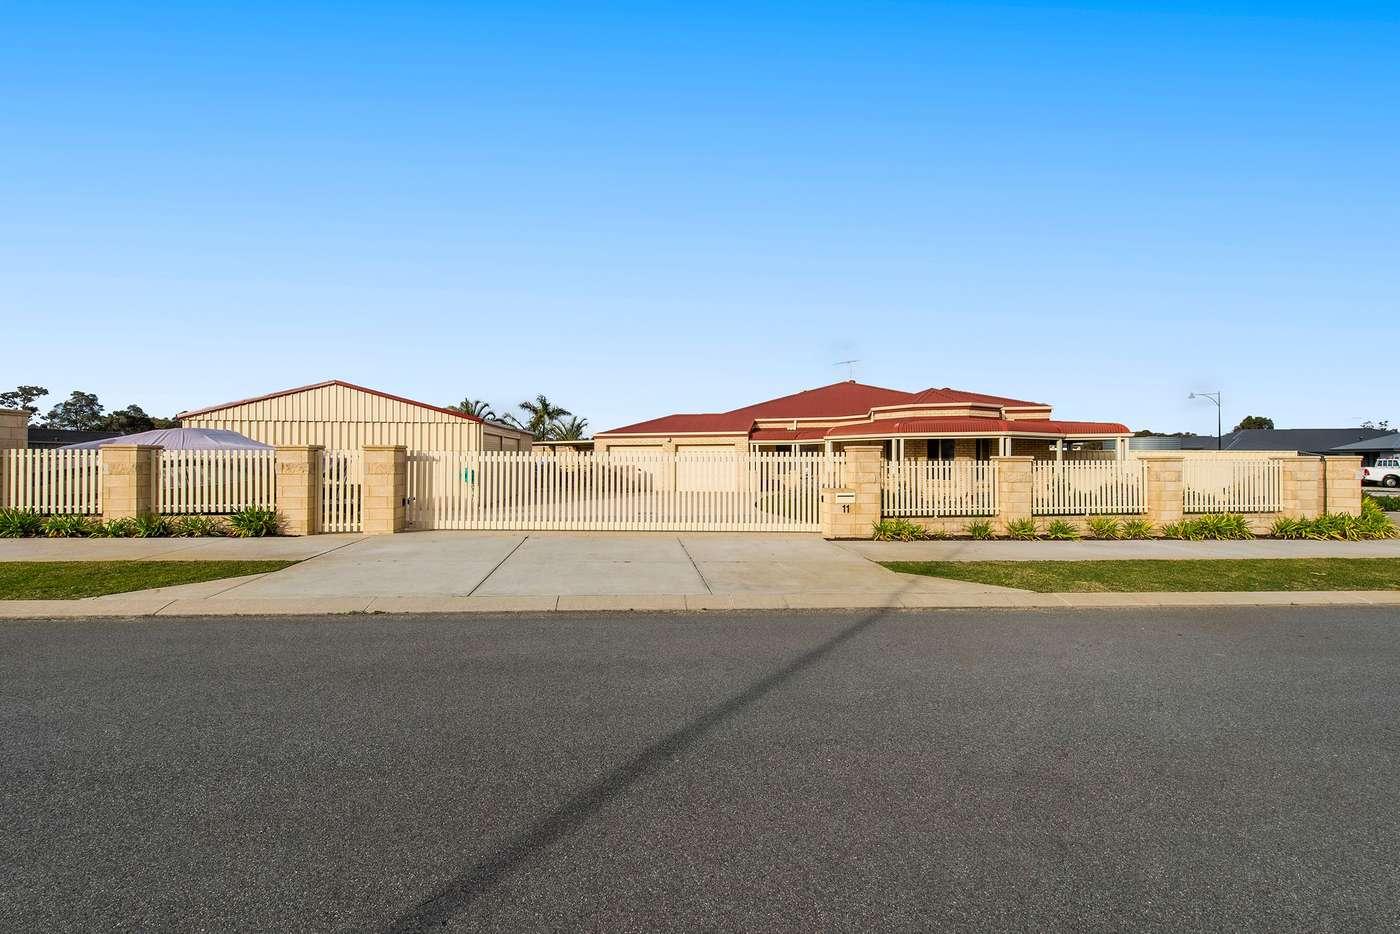 Main view of Homely house listing, 11 Ella Street, Baldivis, WA 6171